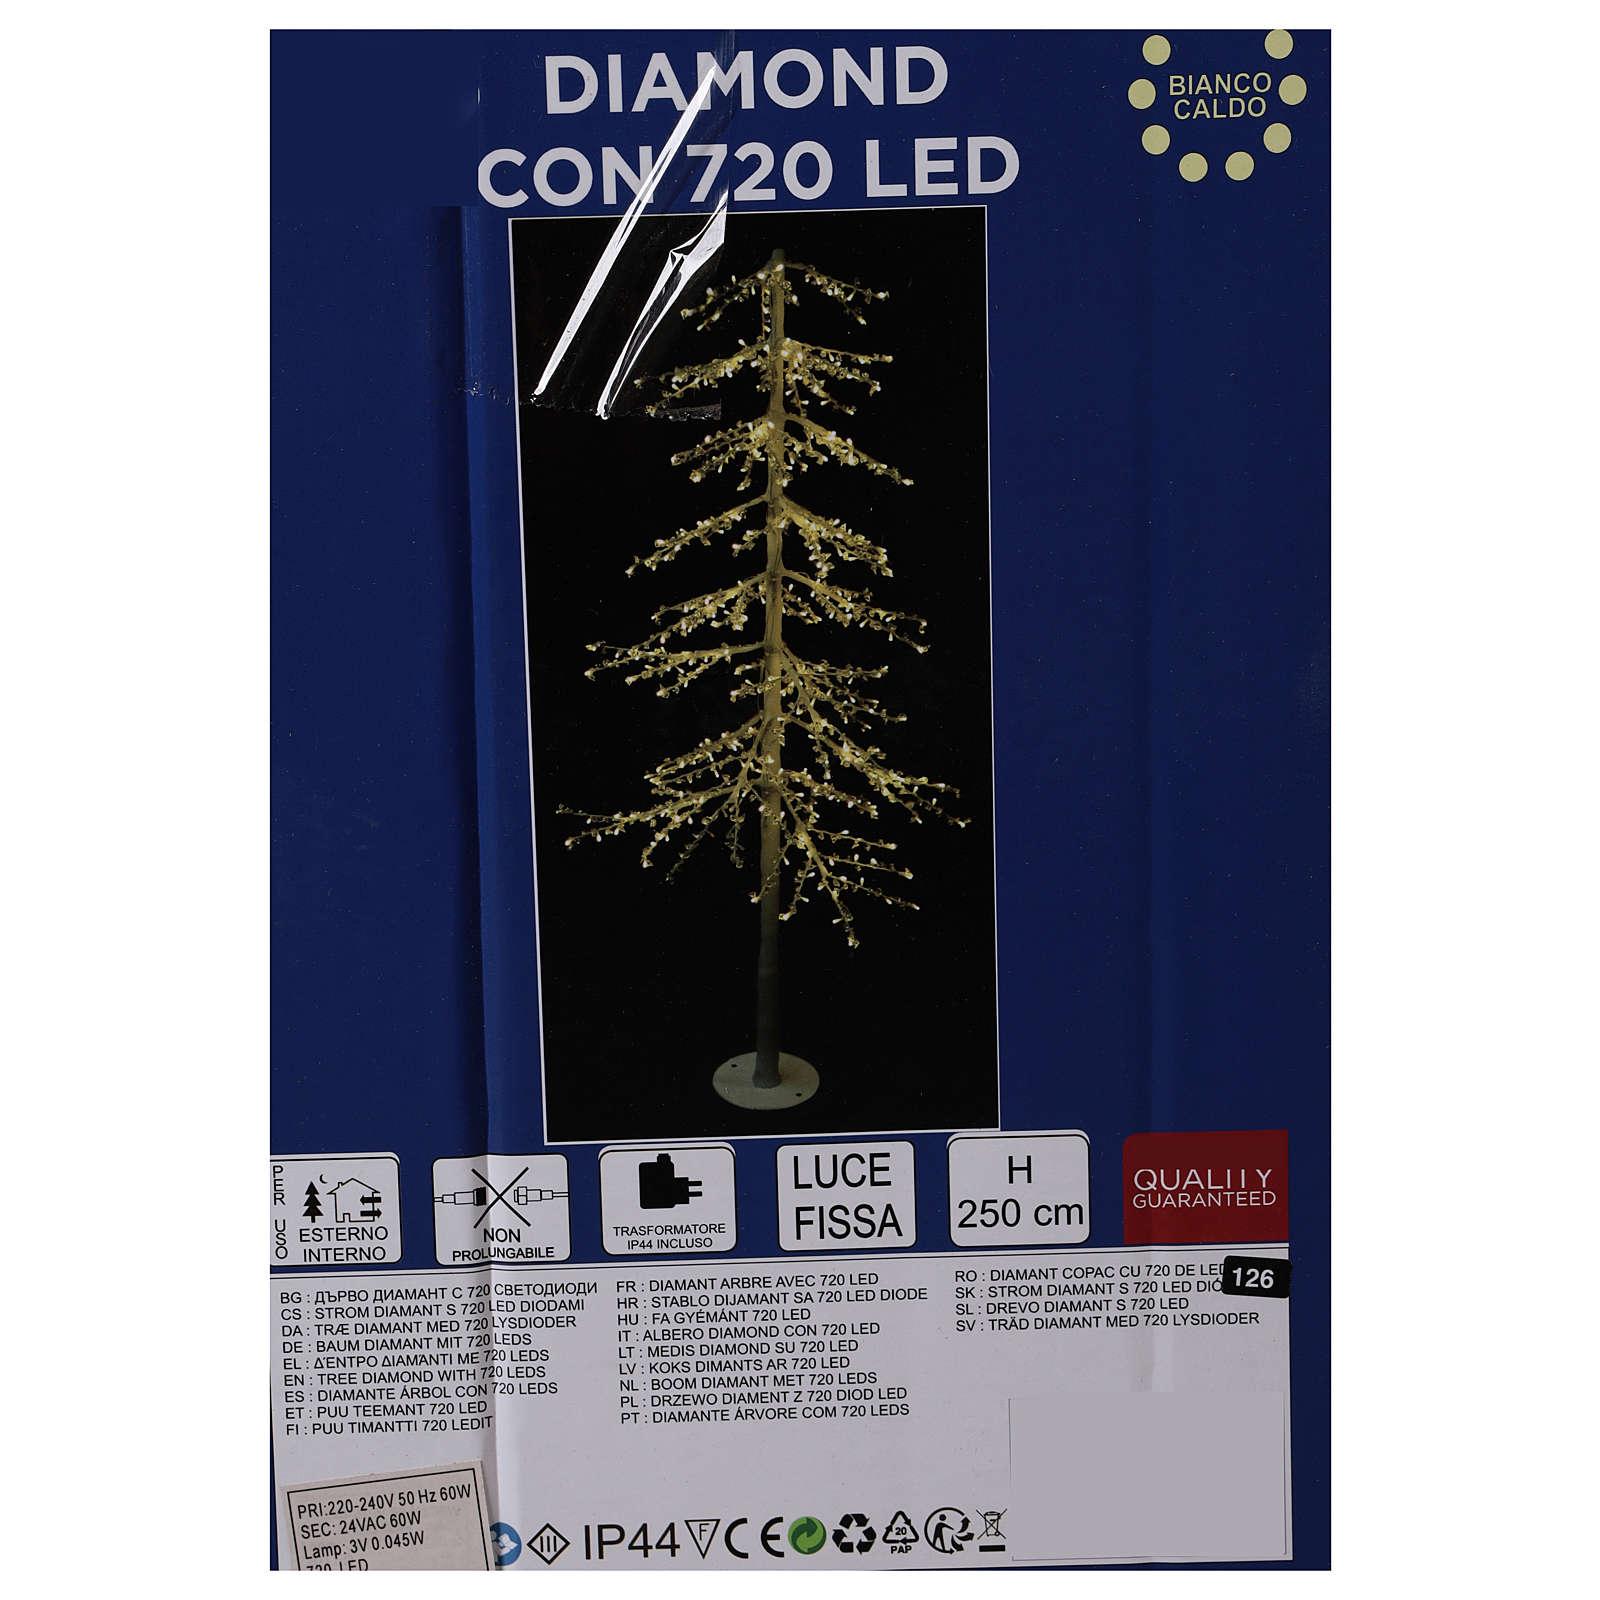 Albero luminoso Diamond 250 cm 720 led bianco caldo esterno corrente 3